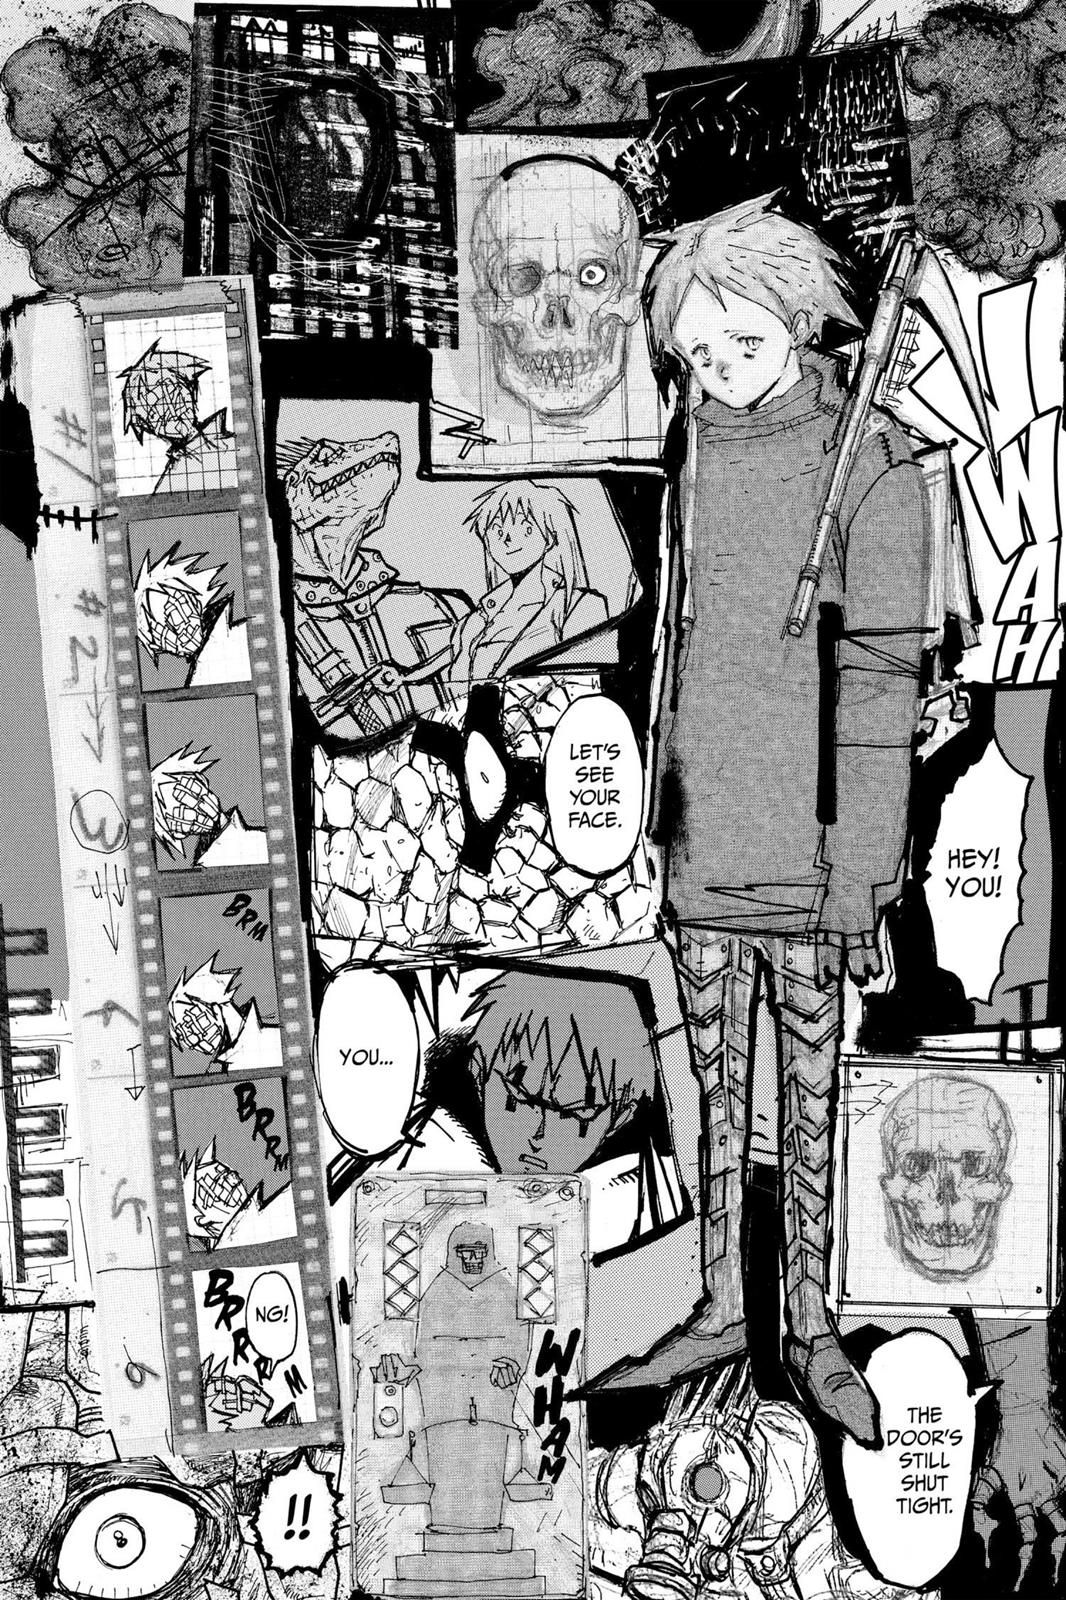 Dorohedoro Chapter 5 Page 5 漫画 コマ, イラスト, 設定画